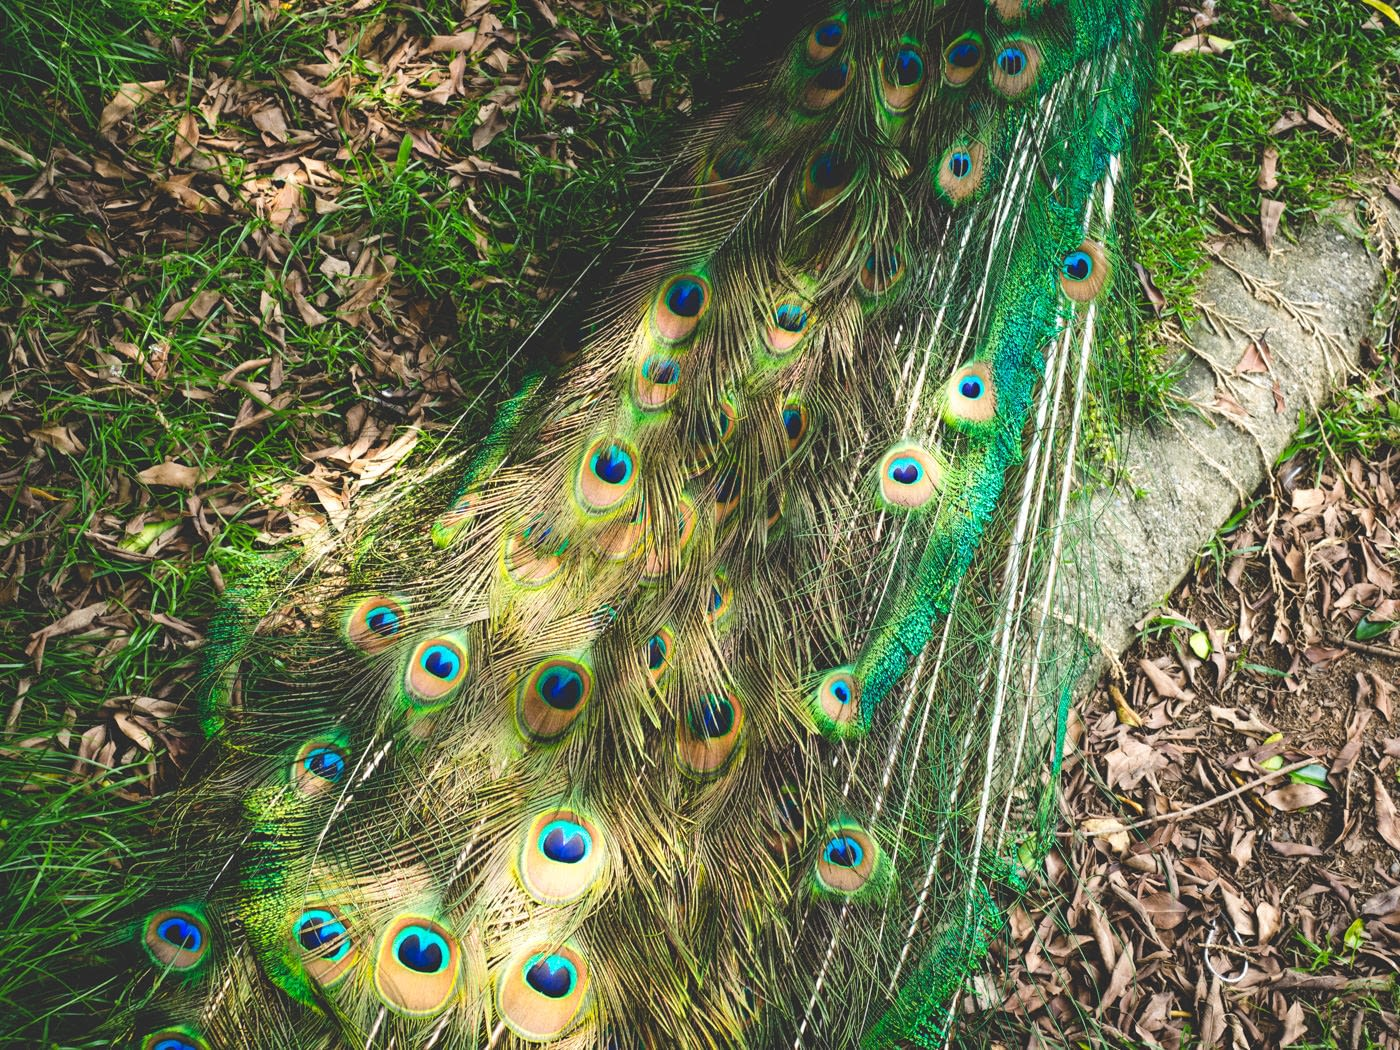 Taiwan - Peacock Garden - Eyelet feathers